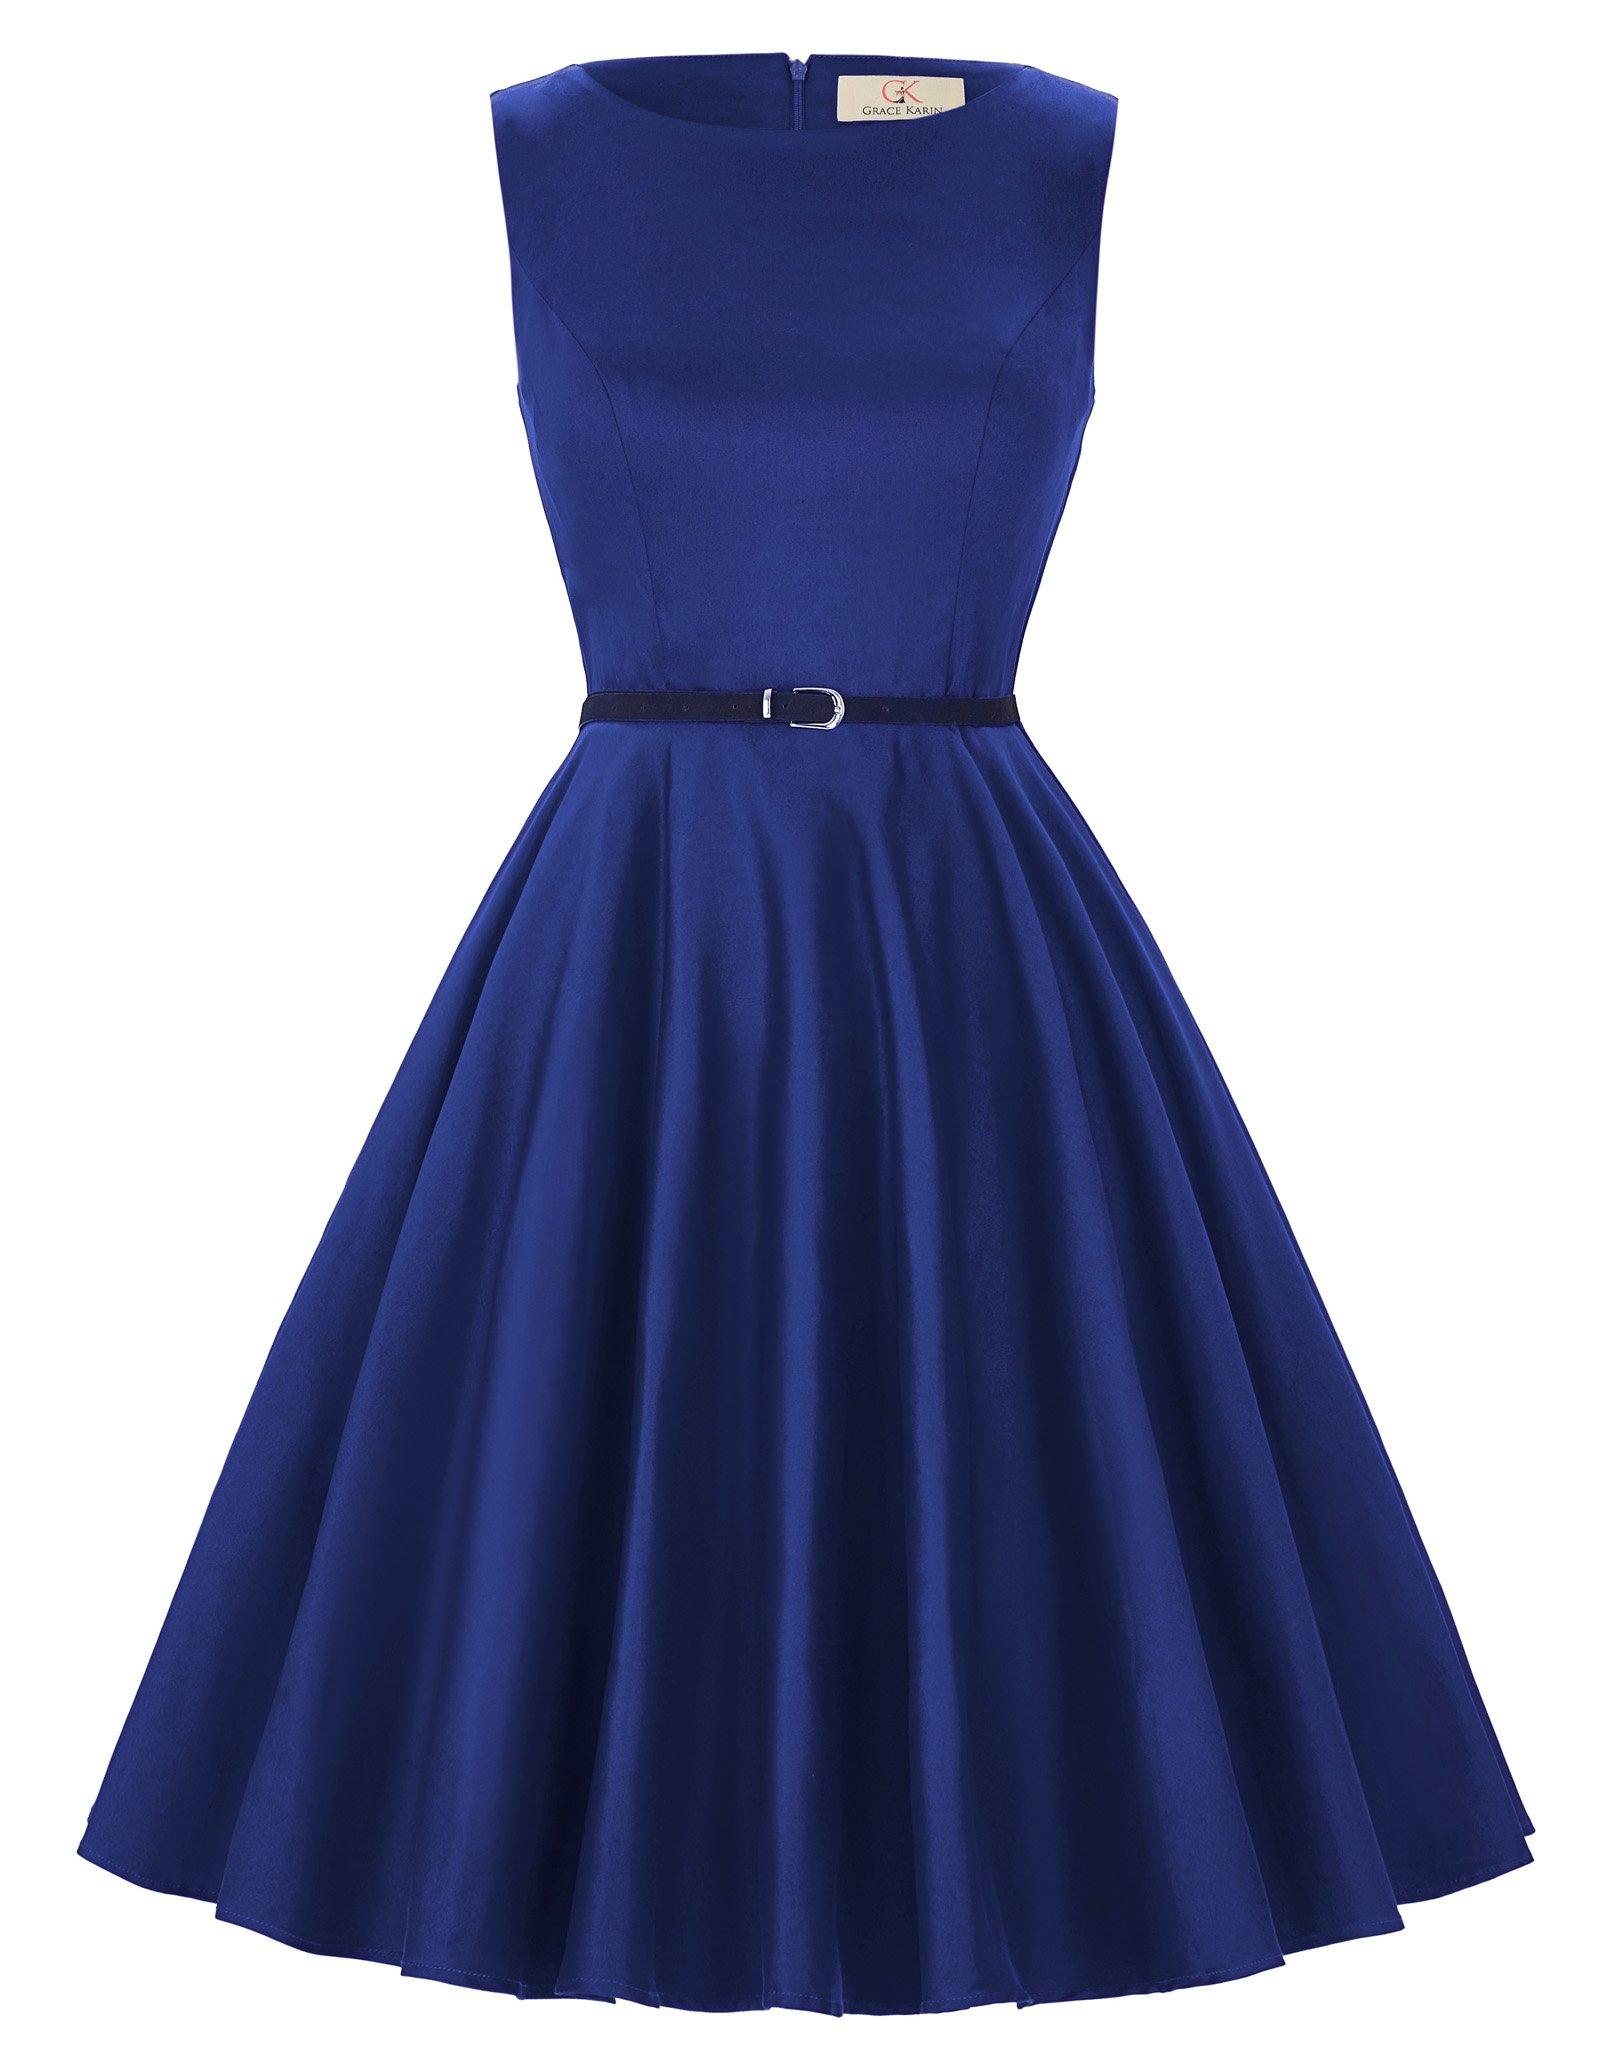 GRACE KARIN 1950's Cocktail Dresses for Women Audrey Hepburn Size S F-54